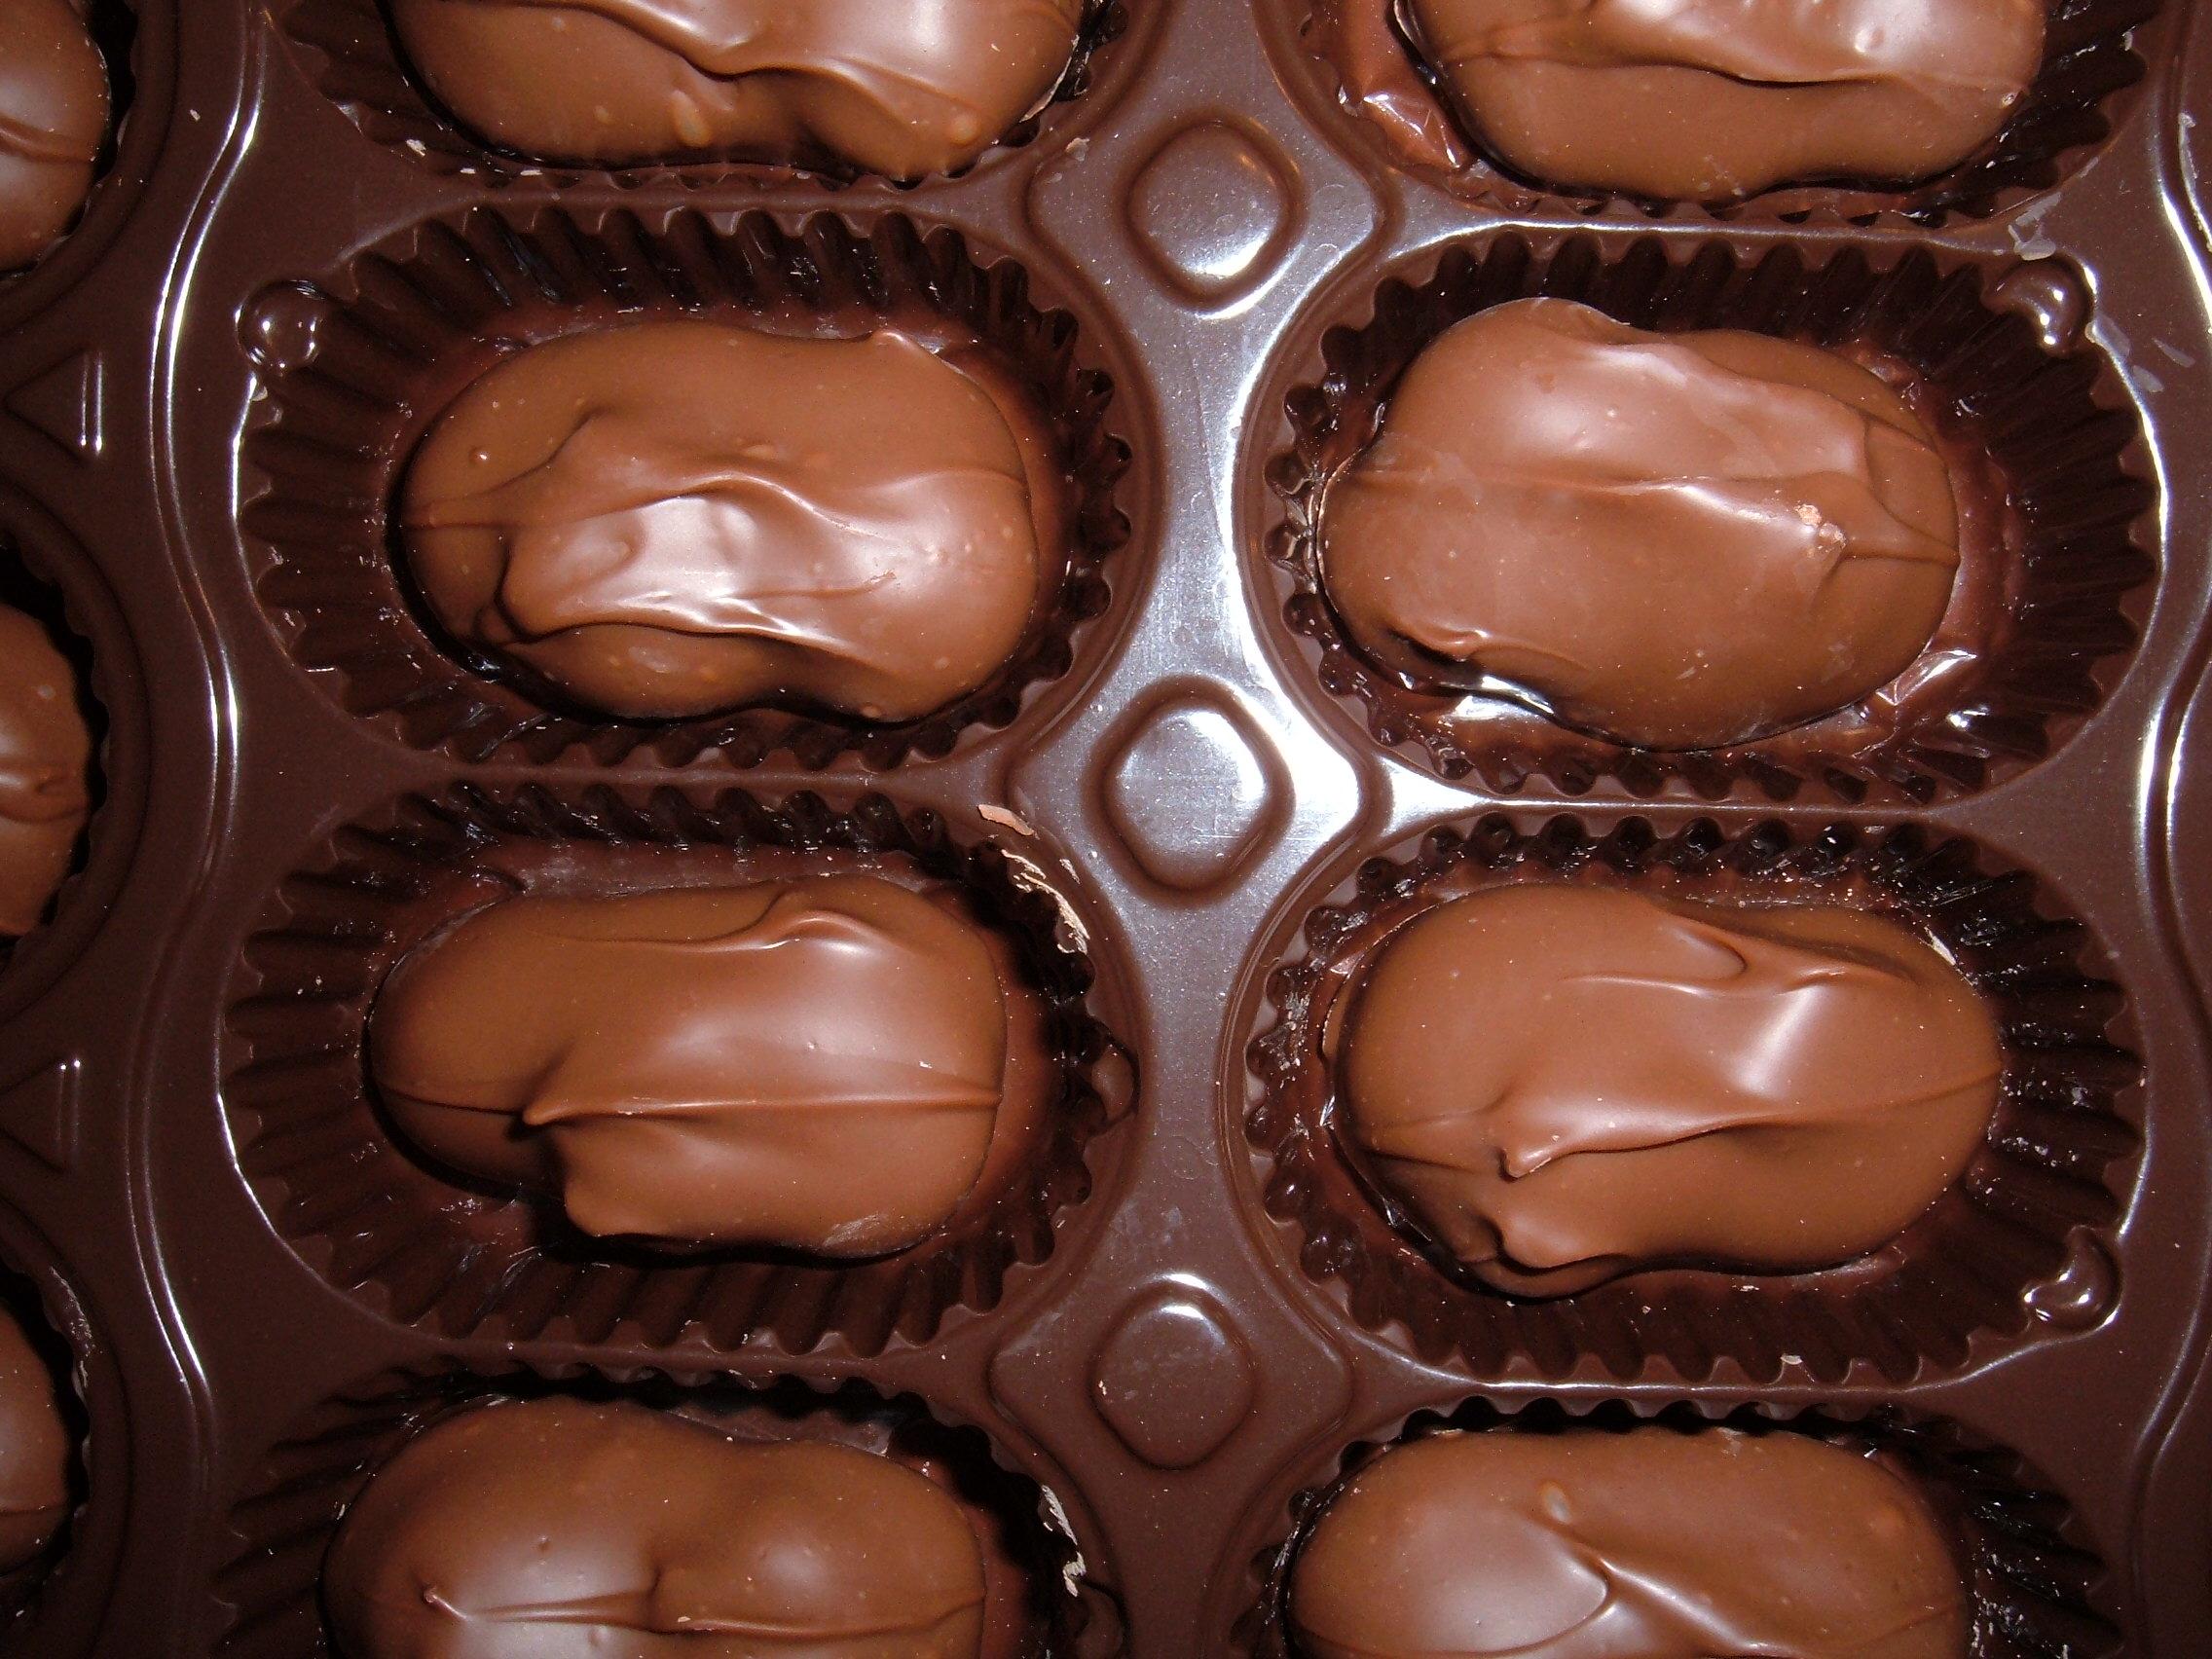 File:Chocolate-covered macadamia nuts.JPG - Wikipedia